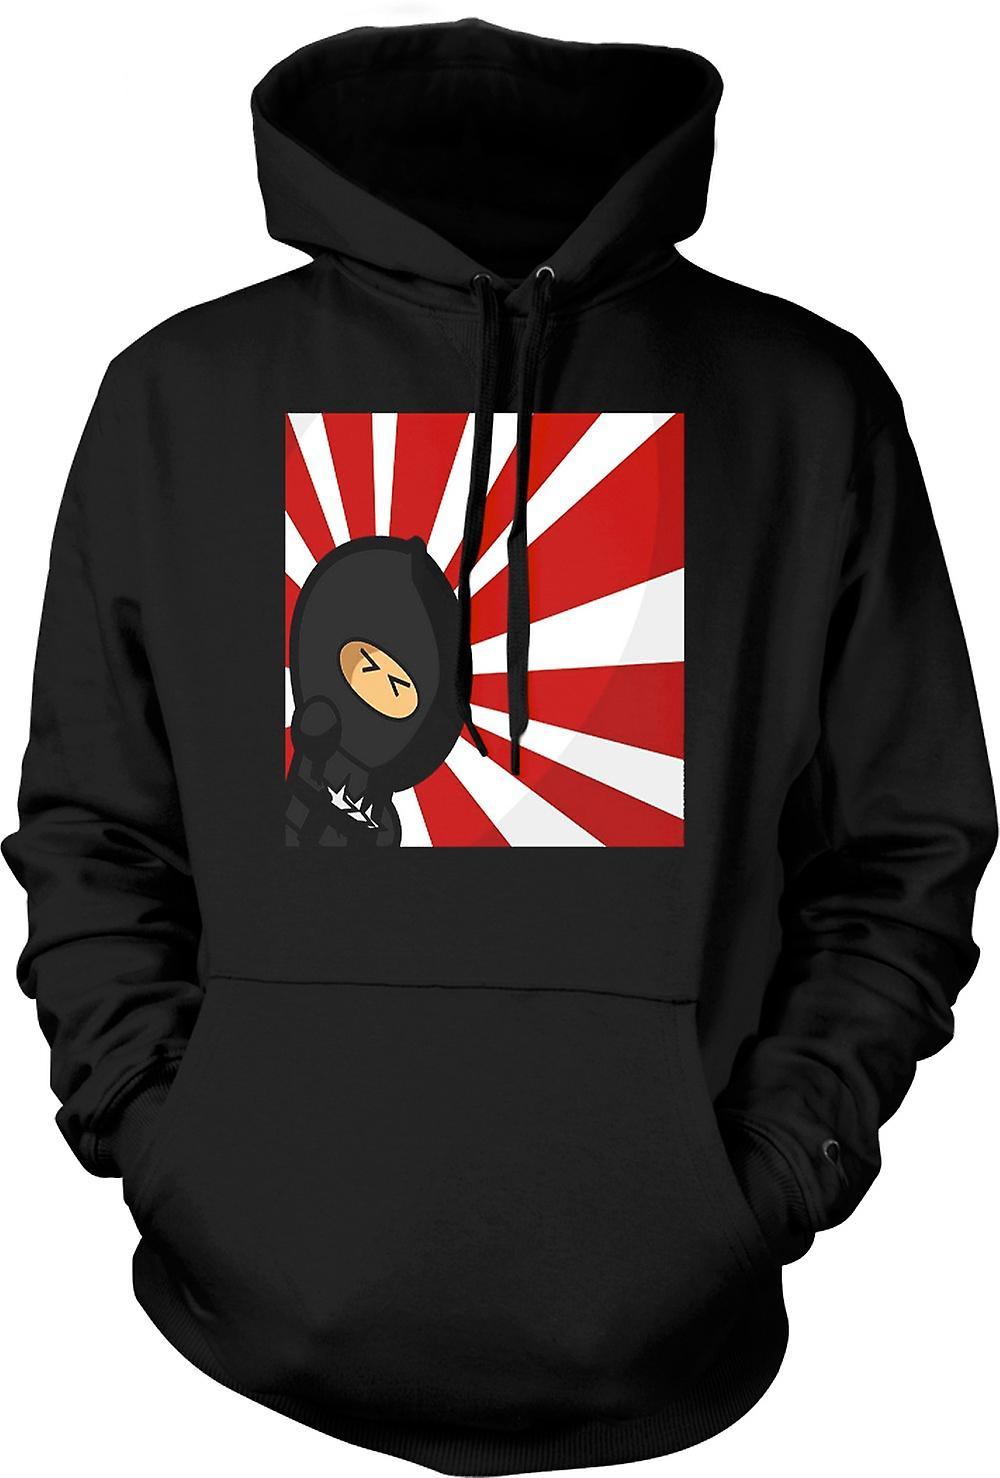 Mens Hoodie - Ninja - Pop Art - divertente